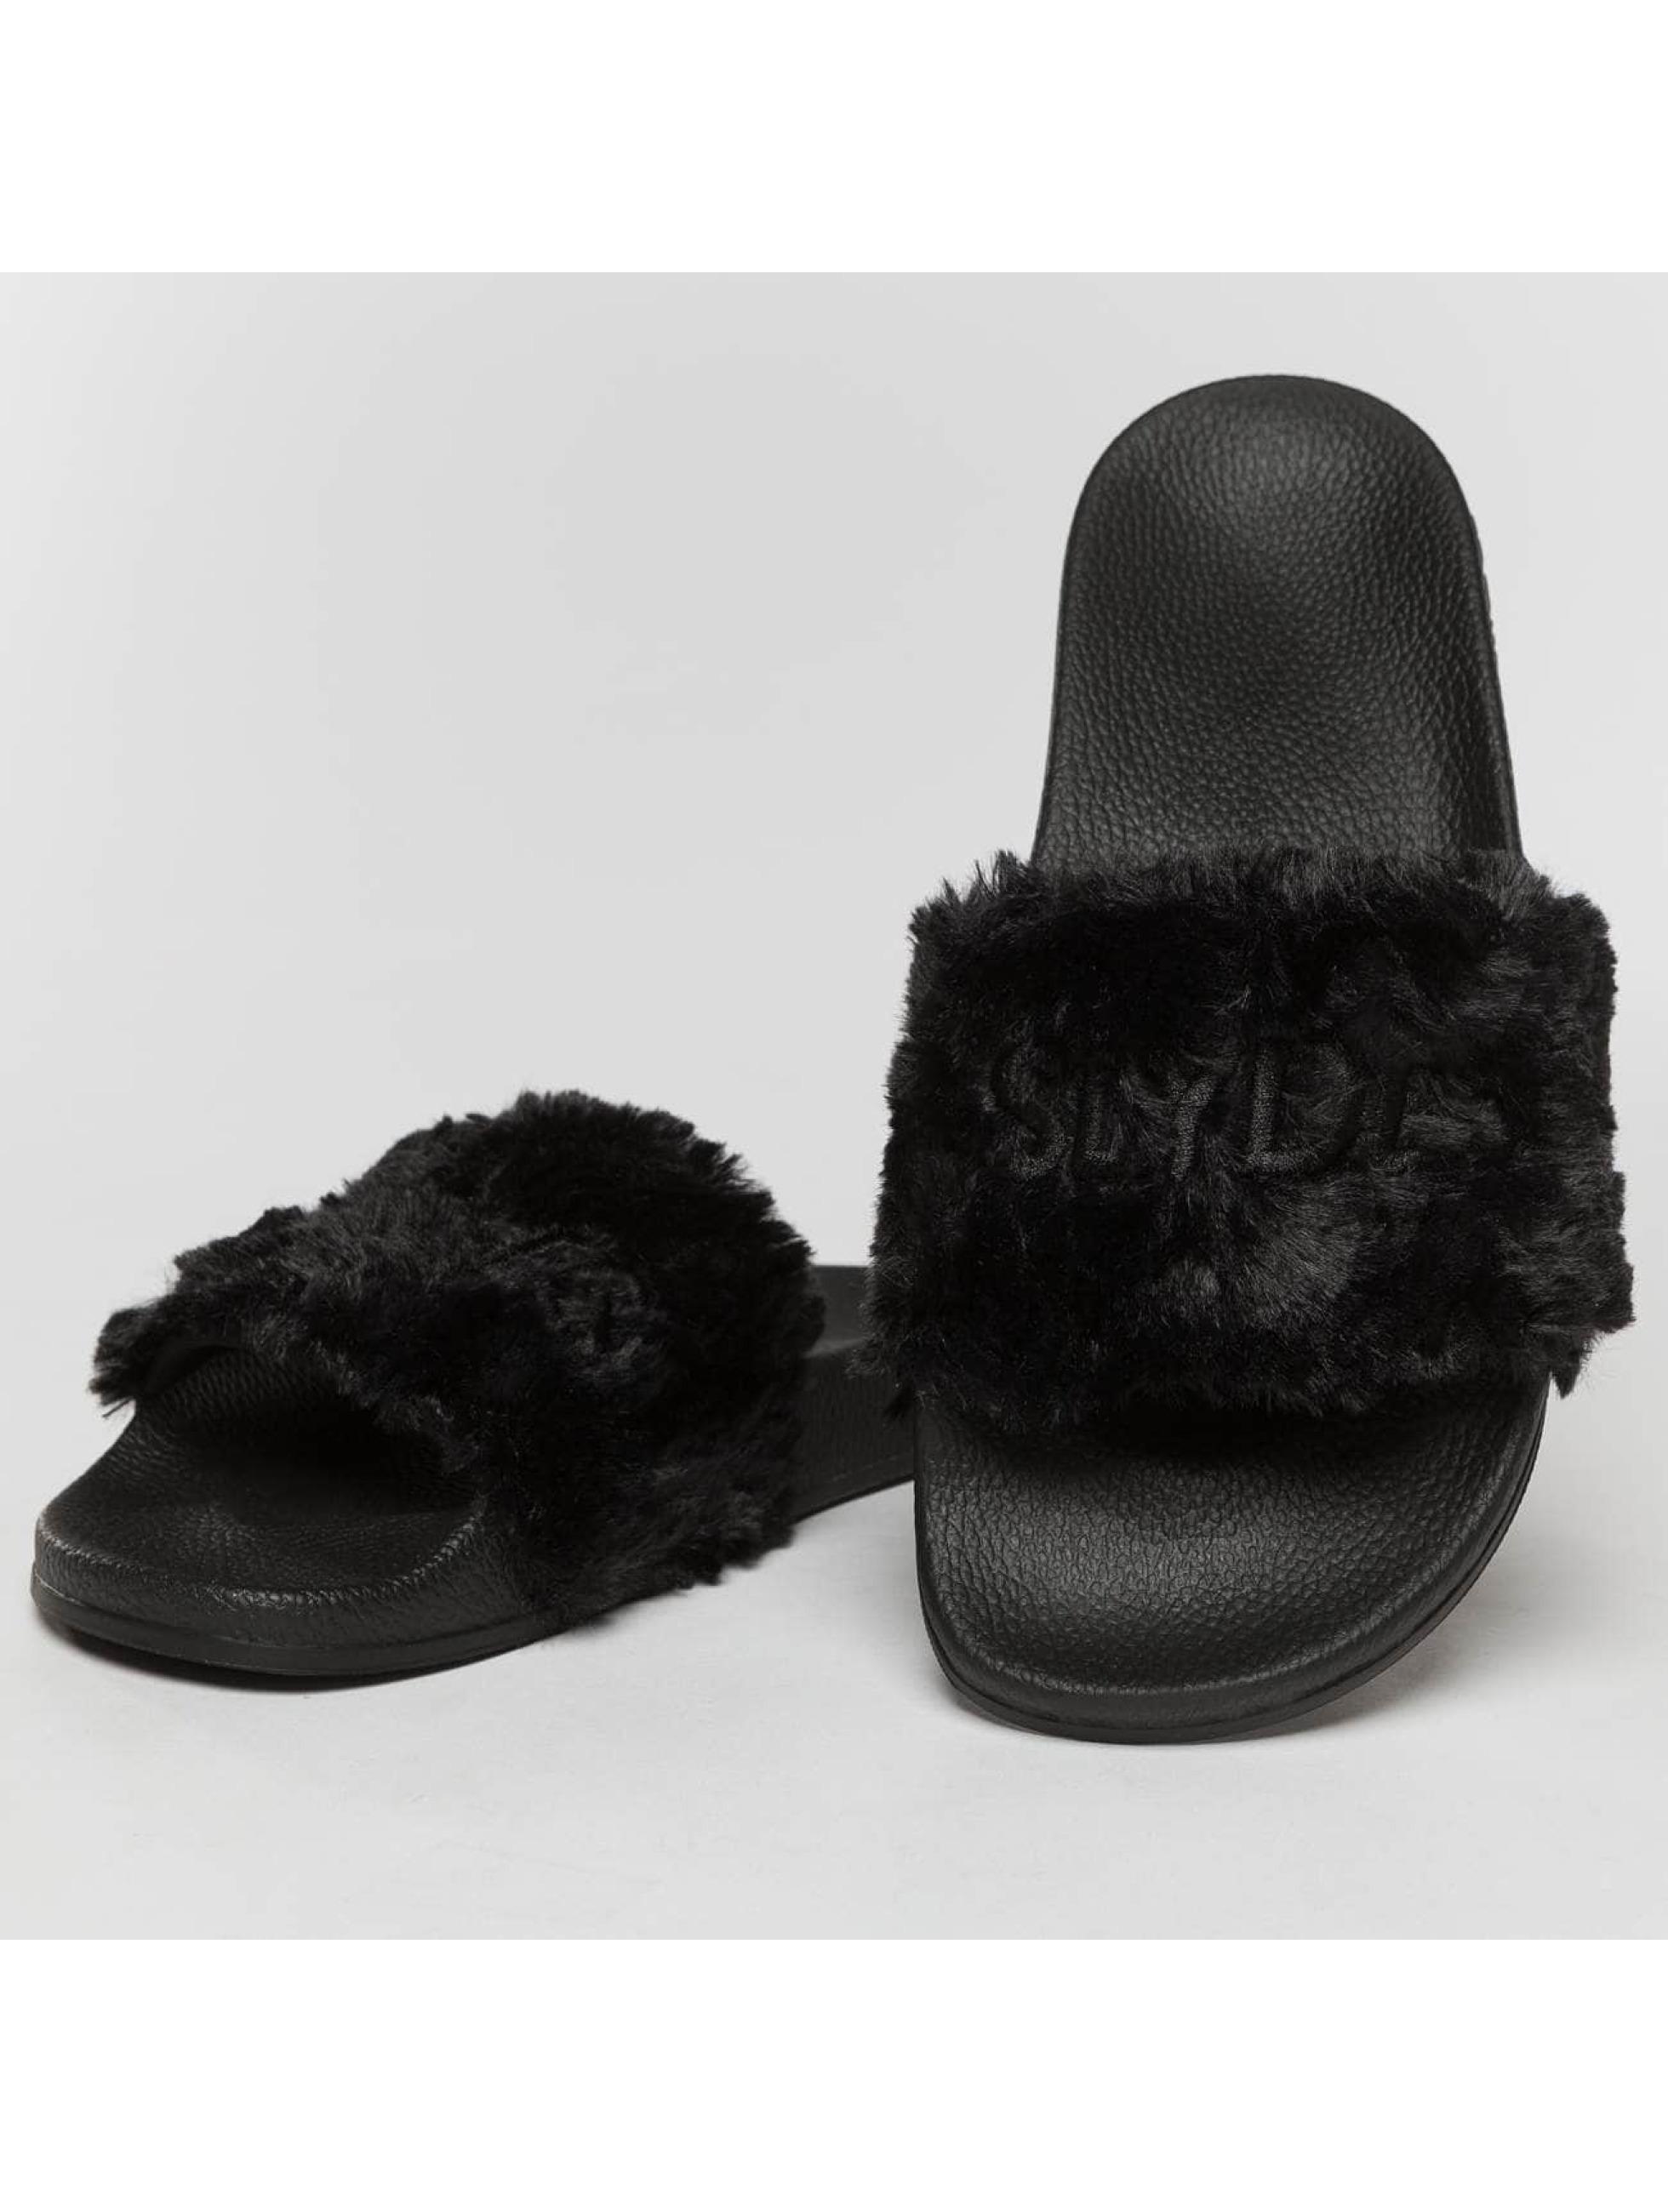 Slydes Sandals Sasha black